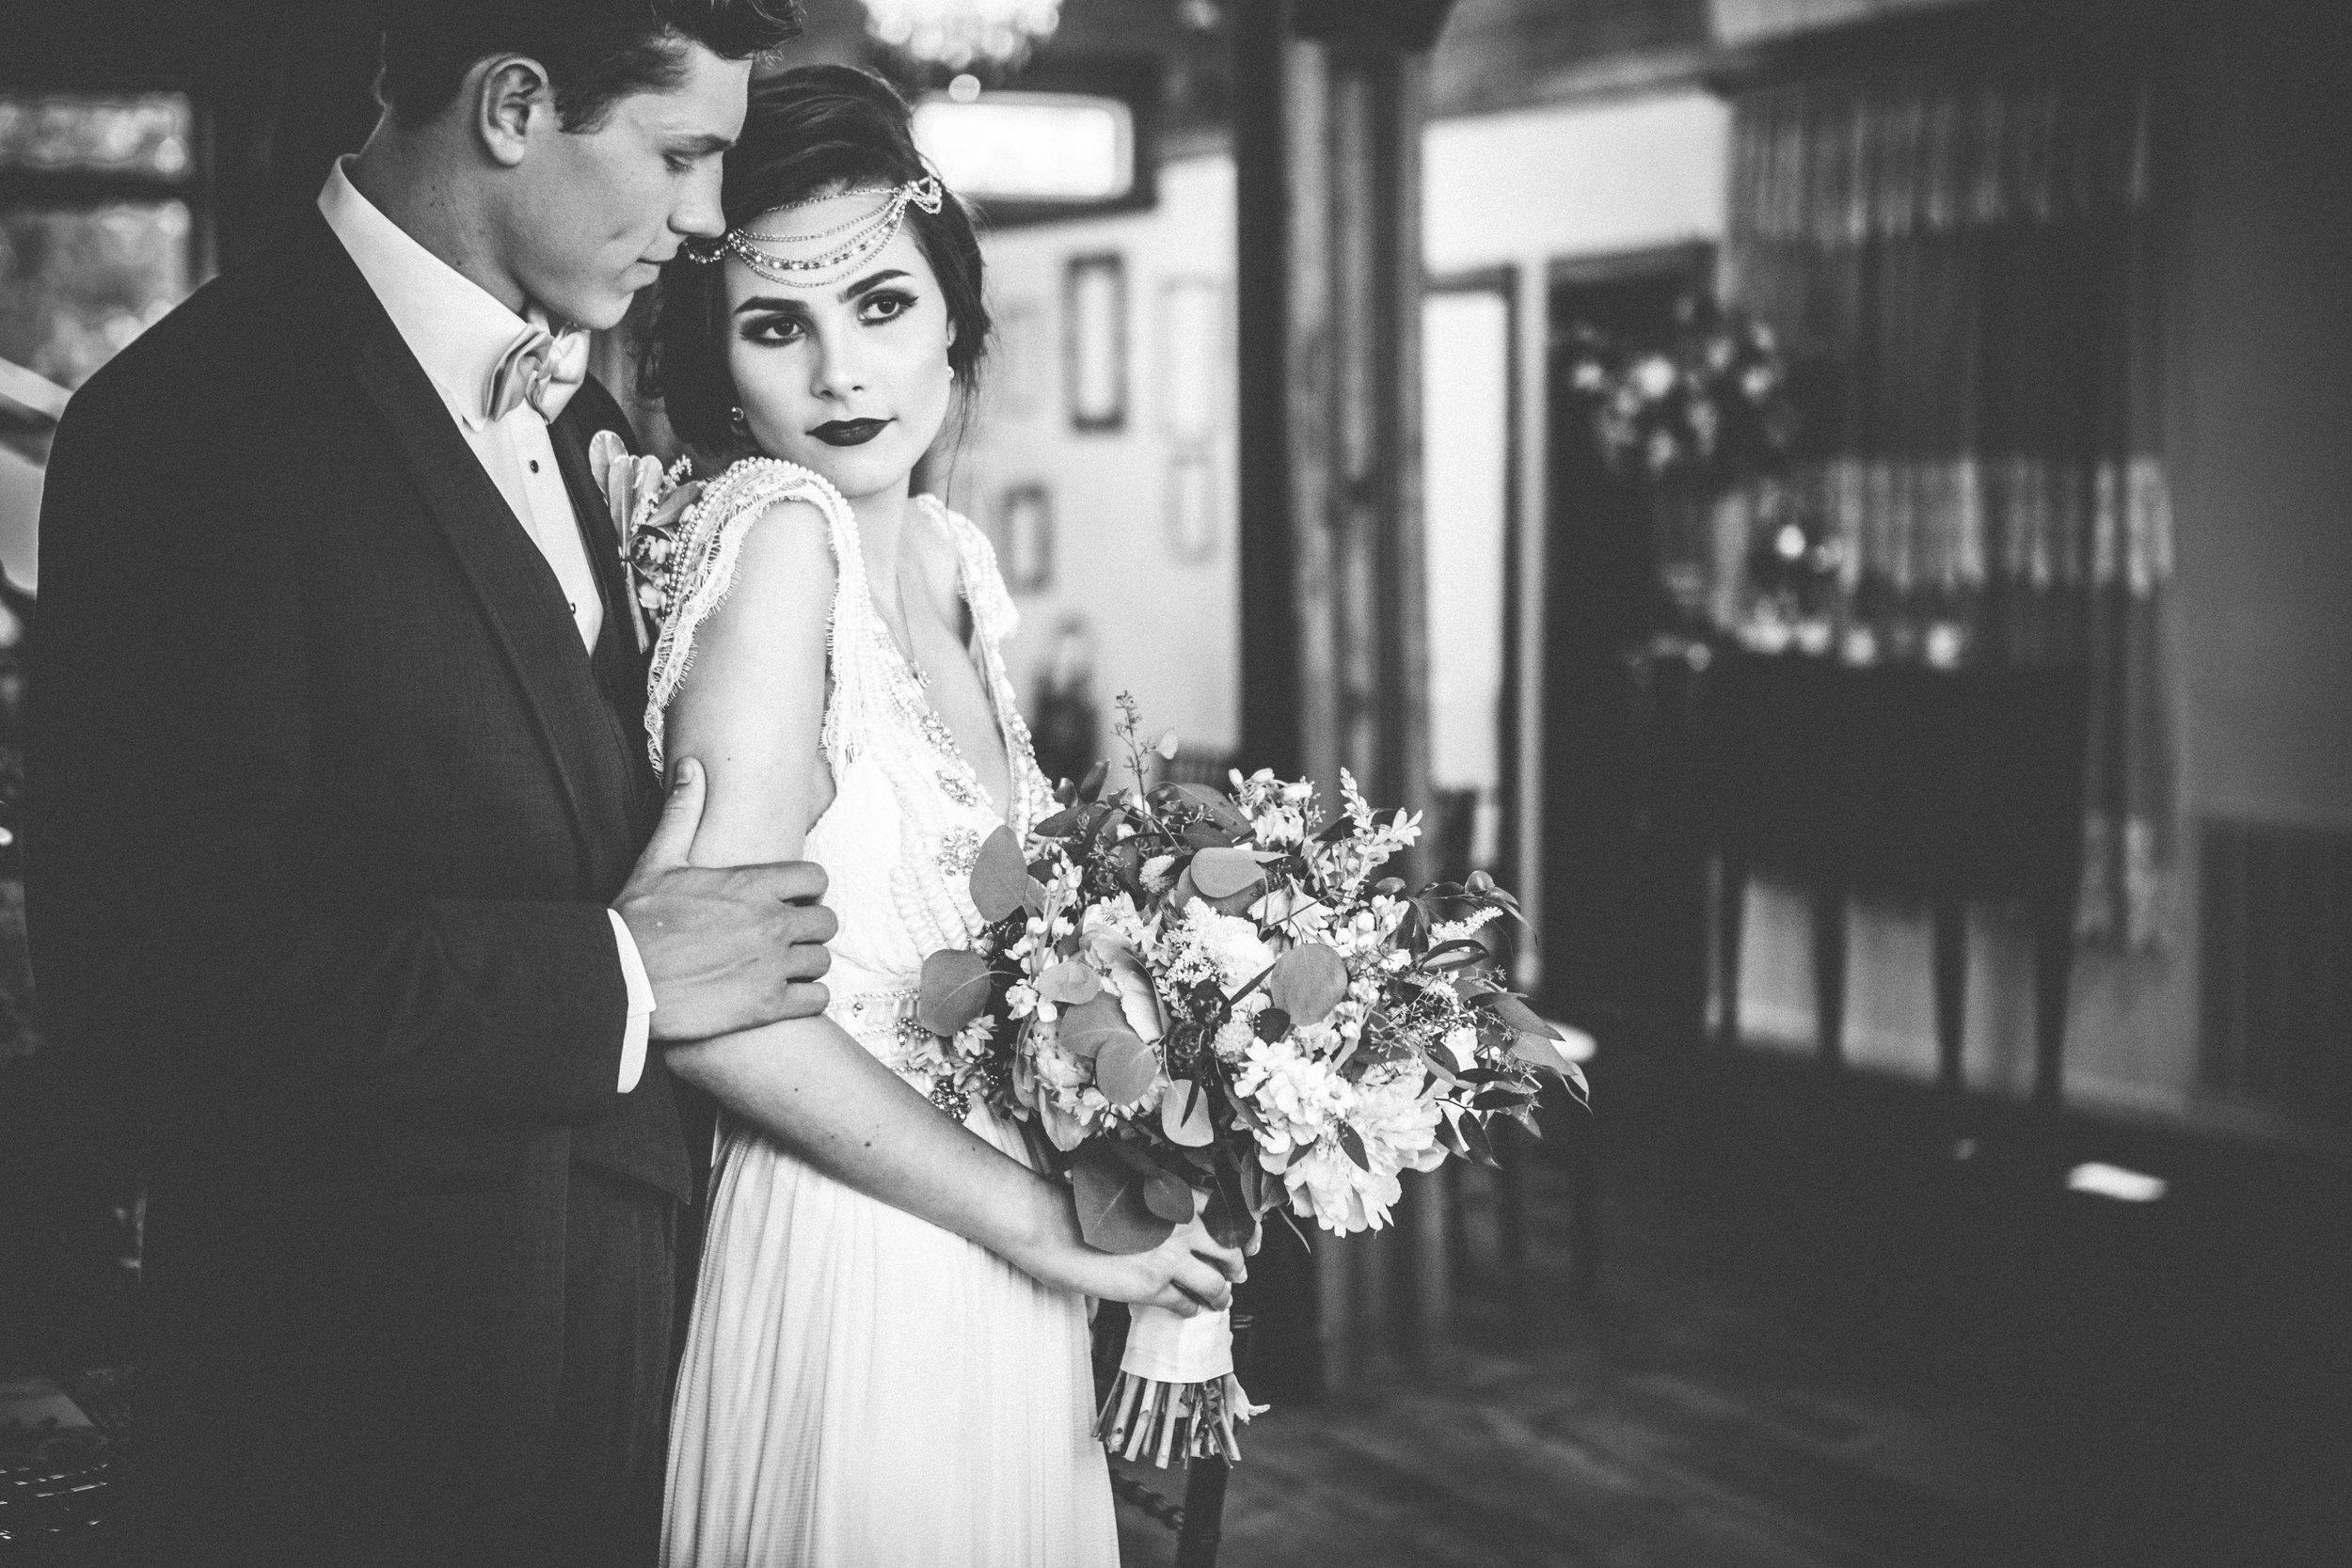 anna-campbell-coco-christa-o'brien-photography-the-corner-district-wedding-atlanta-wedding-savannah-bridal-boutique-ivory-and-beau-bridal-boutique-savannah-bridal-gowns-savannah-bridal-atlanta-bridal-boutique-borrowed-and-blue-6.jpg